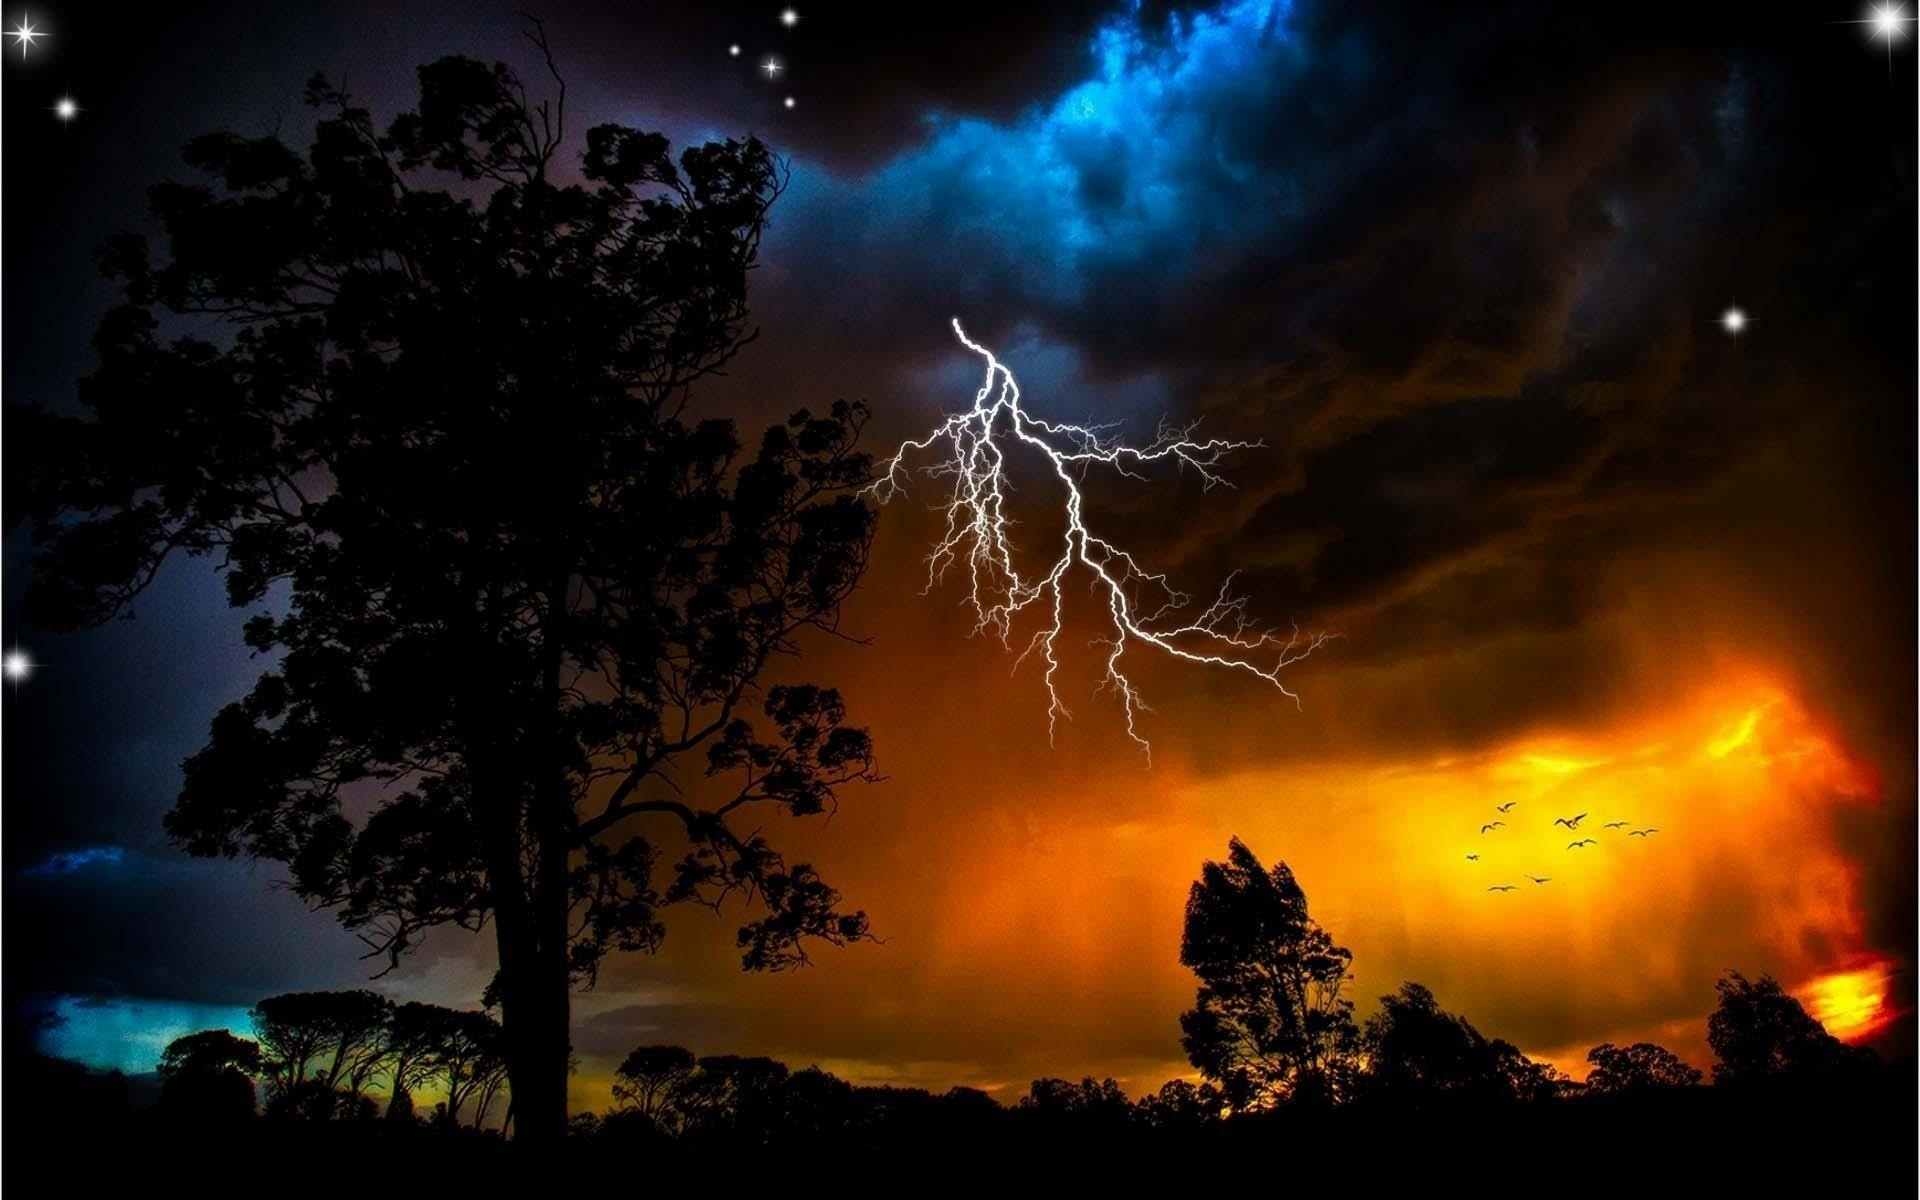 wallpaper.wiki-Lightning-Storm-Image-PIC-WPD001963